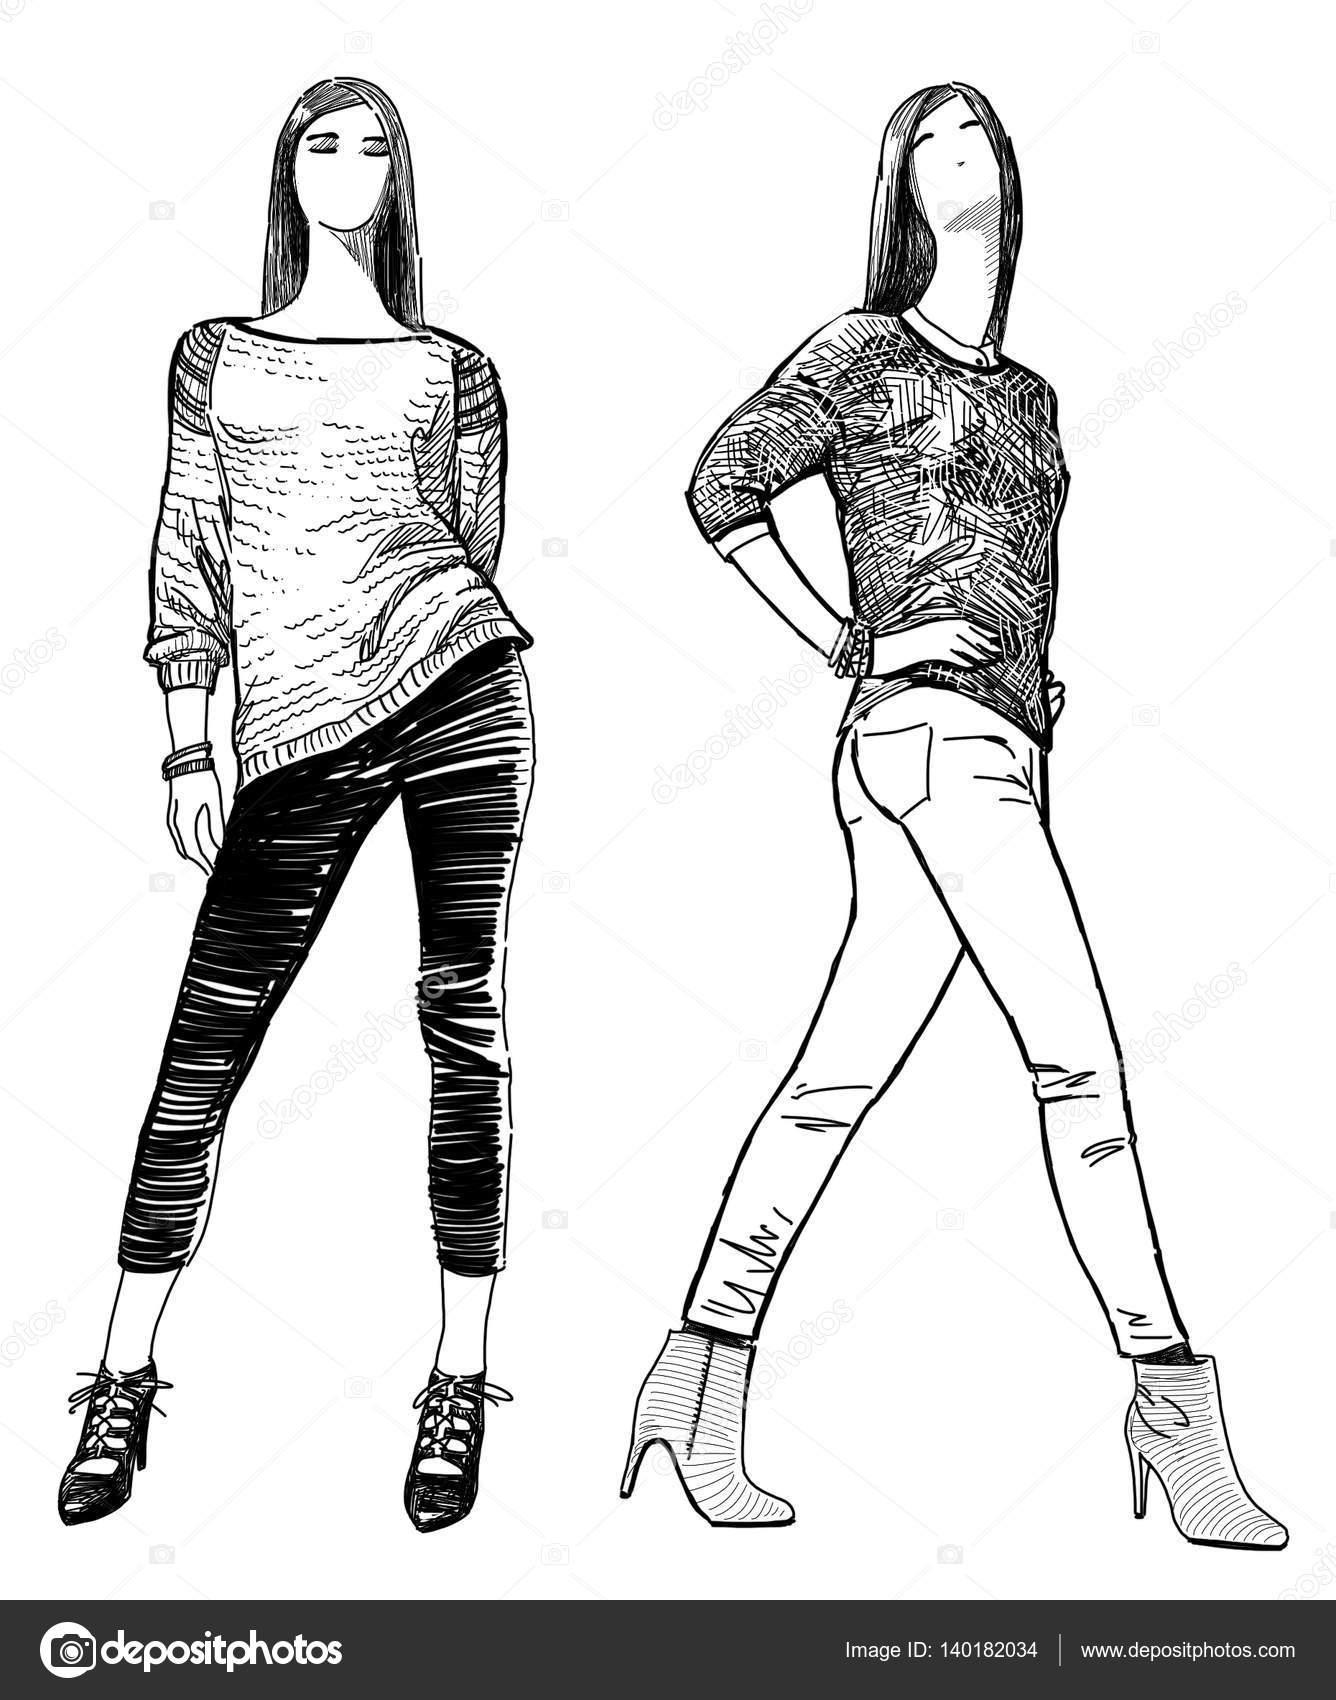 Dibujos Mujeres Modernas Dibujos De Las Chicas De Moda Joven